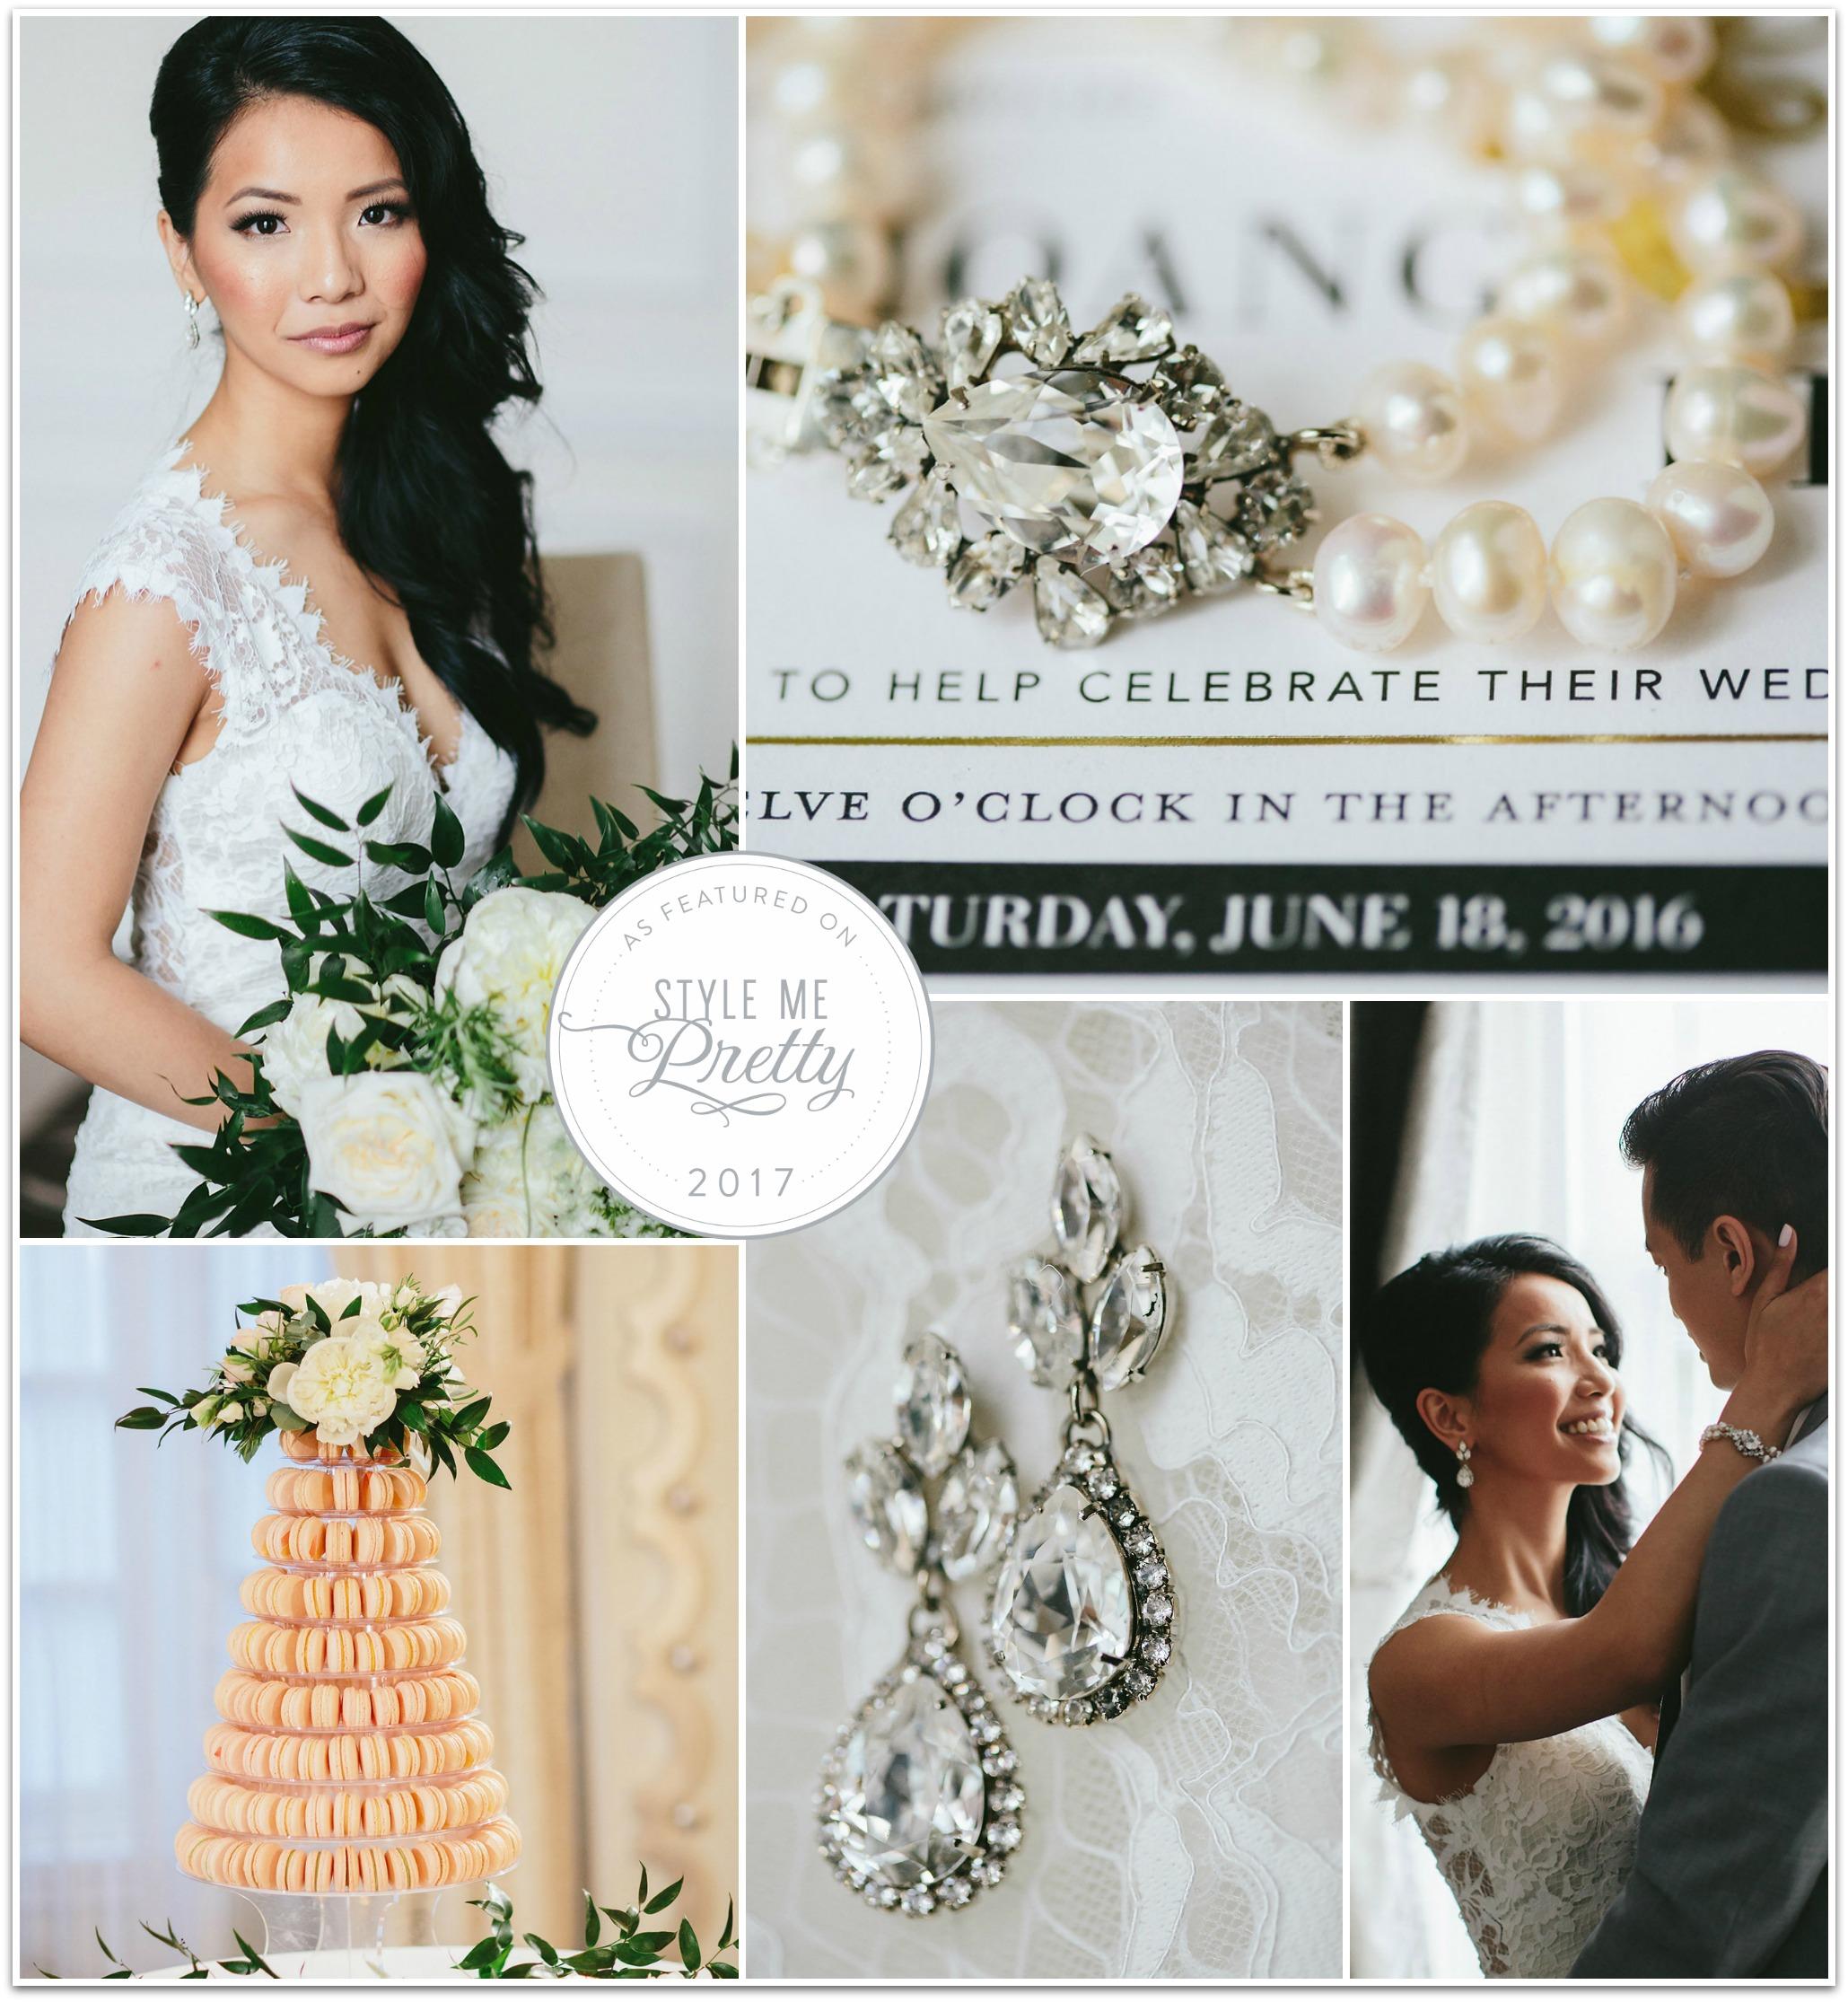 Style Me Pretty Wedding, Jewelry by Elsa Corsi